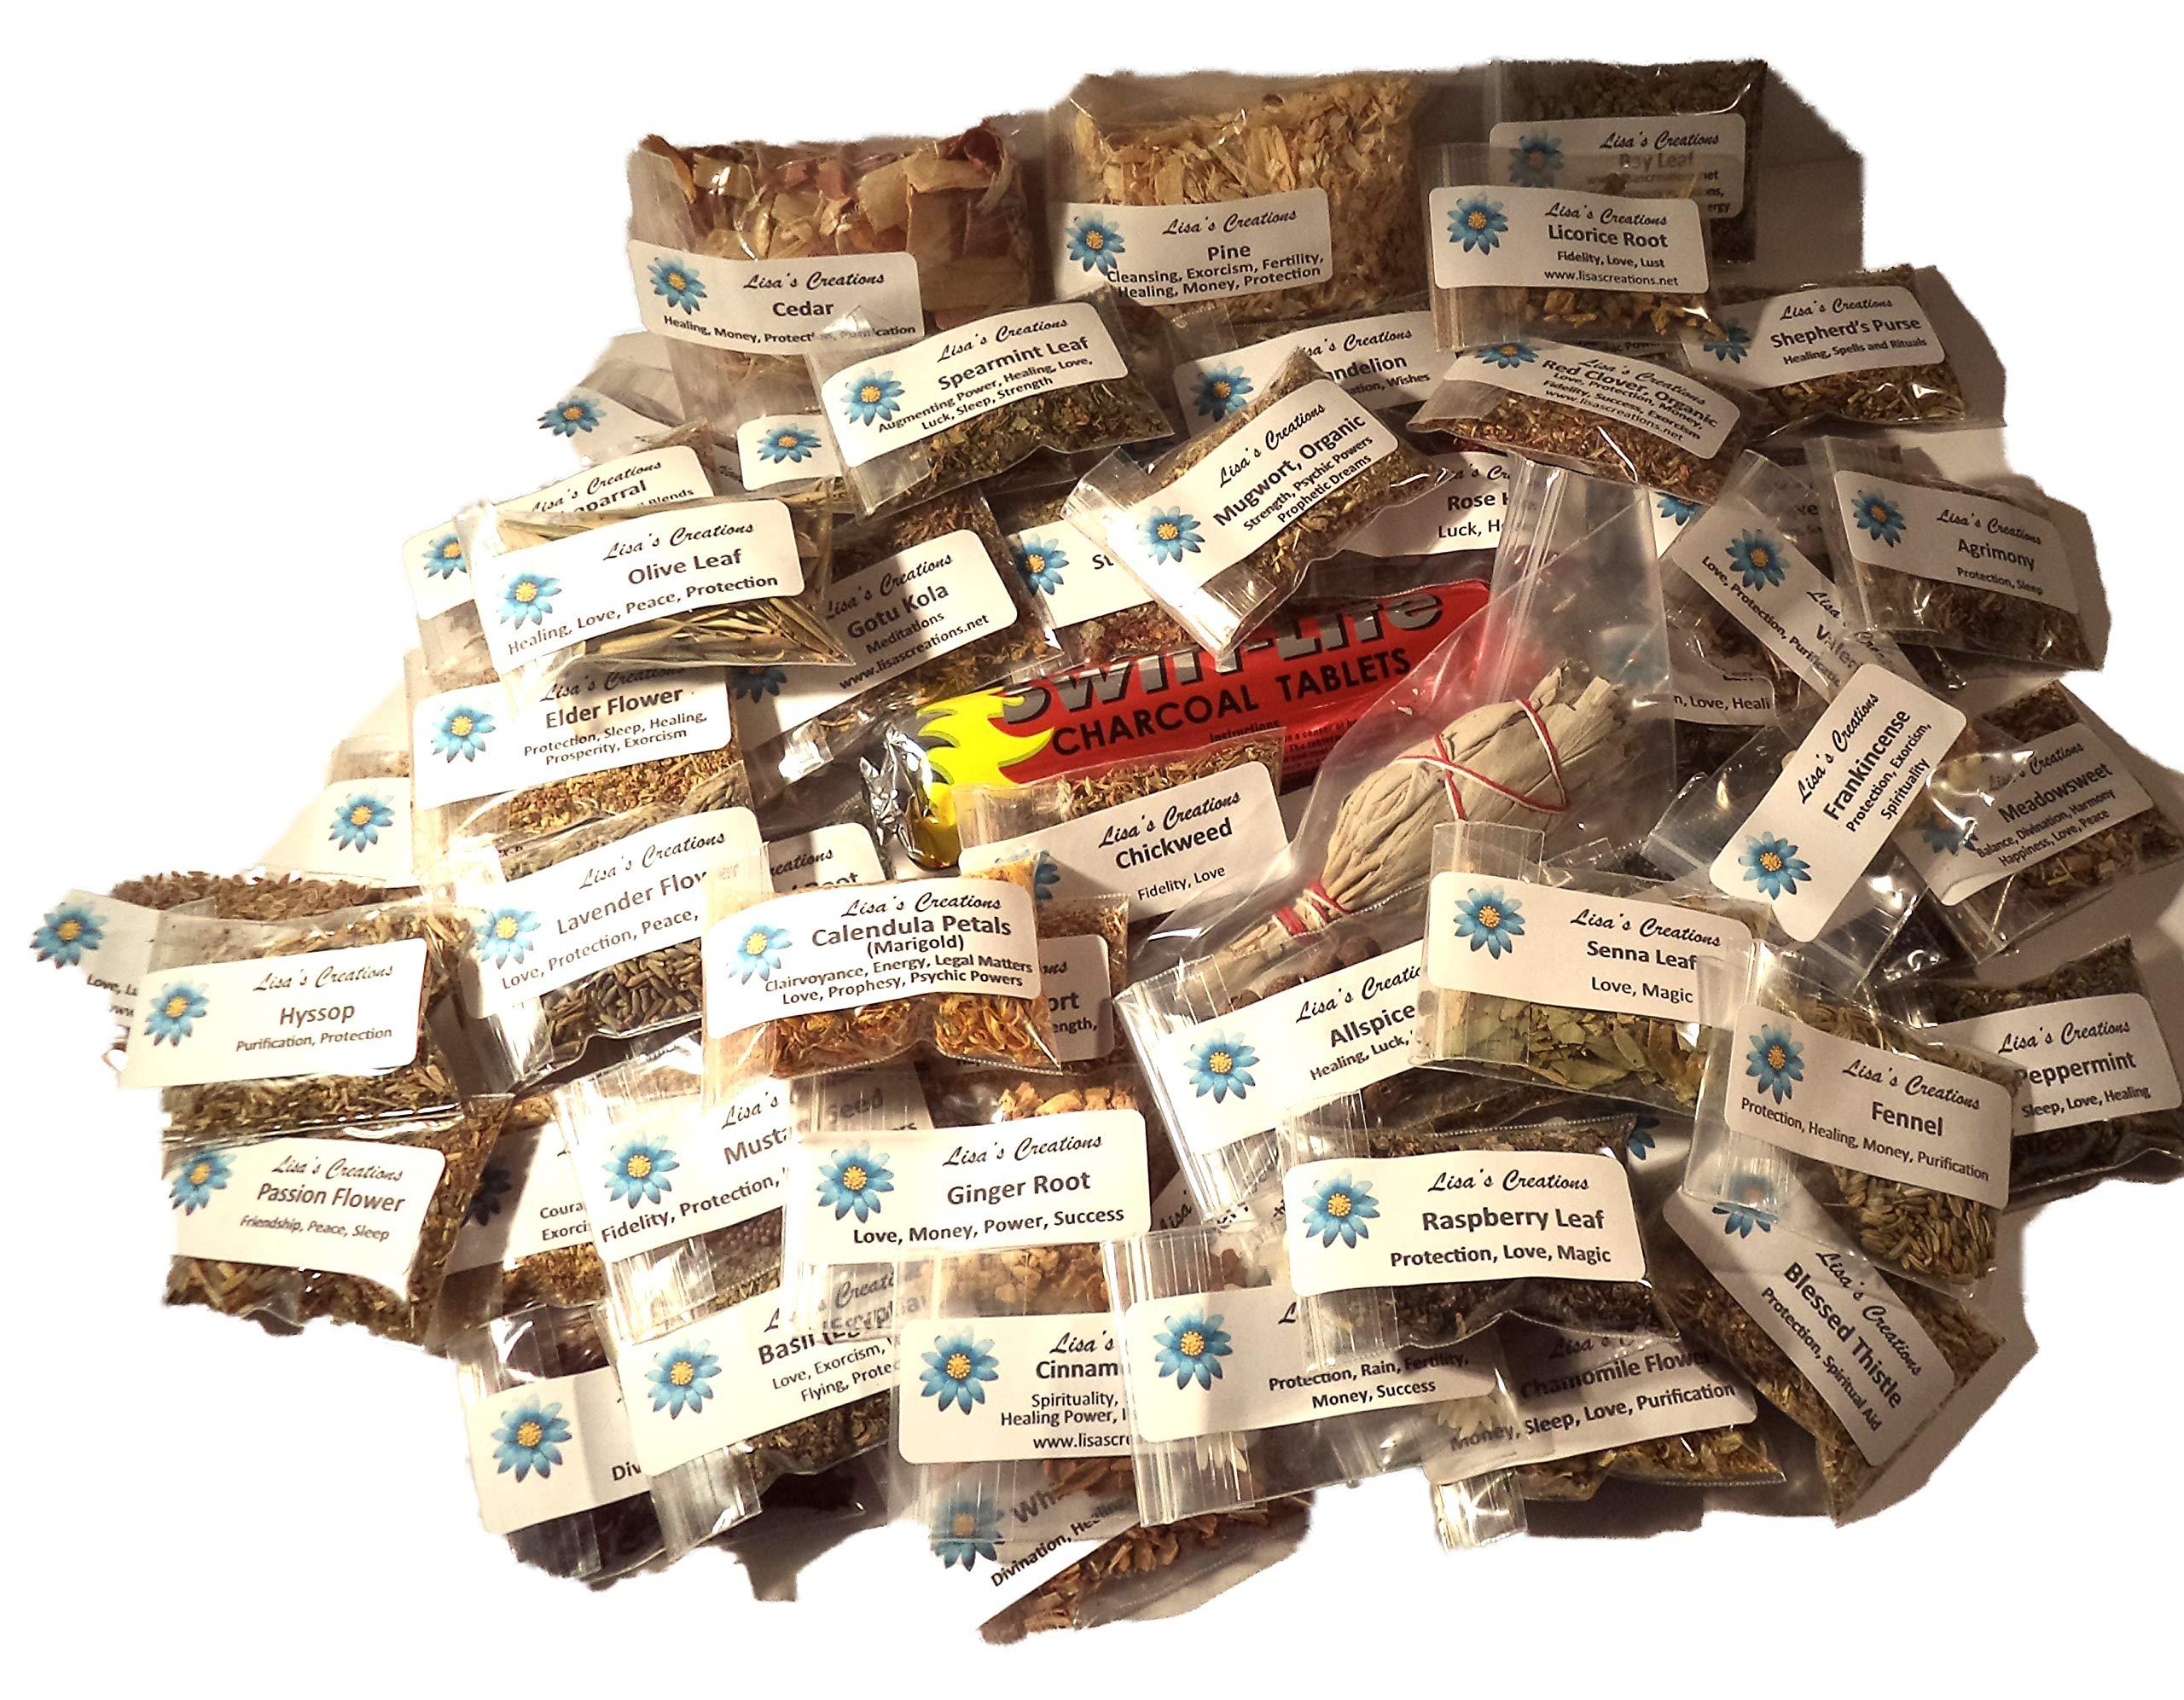 Lisa's Creations, Inc - 85 Herb Sampler Kit - with Charcoal, White Sage Wand, and Handmade 3'' x 3'' Muslin Bags